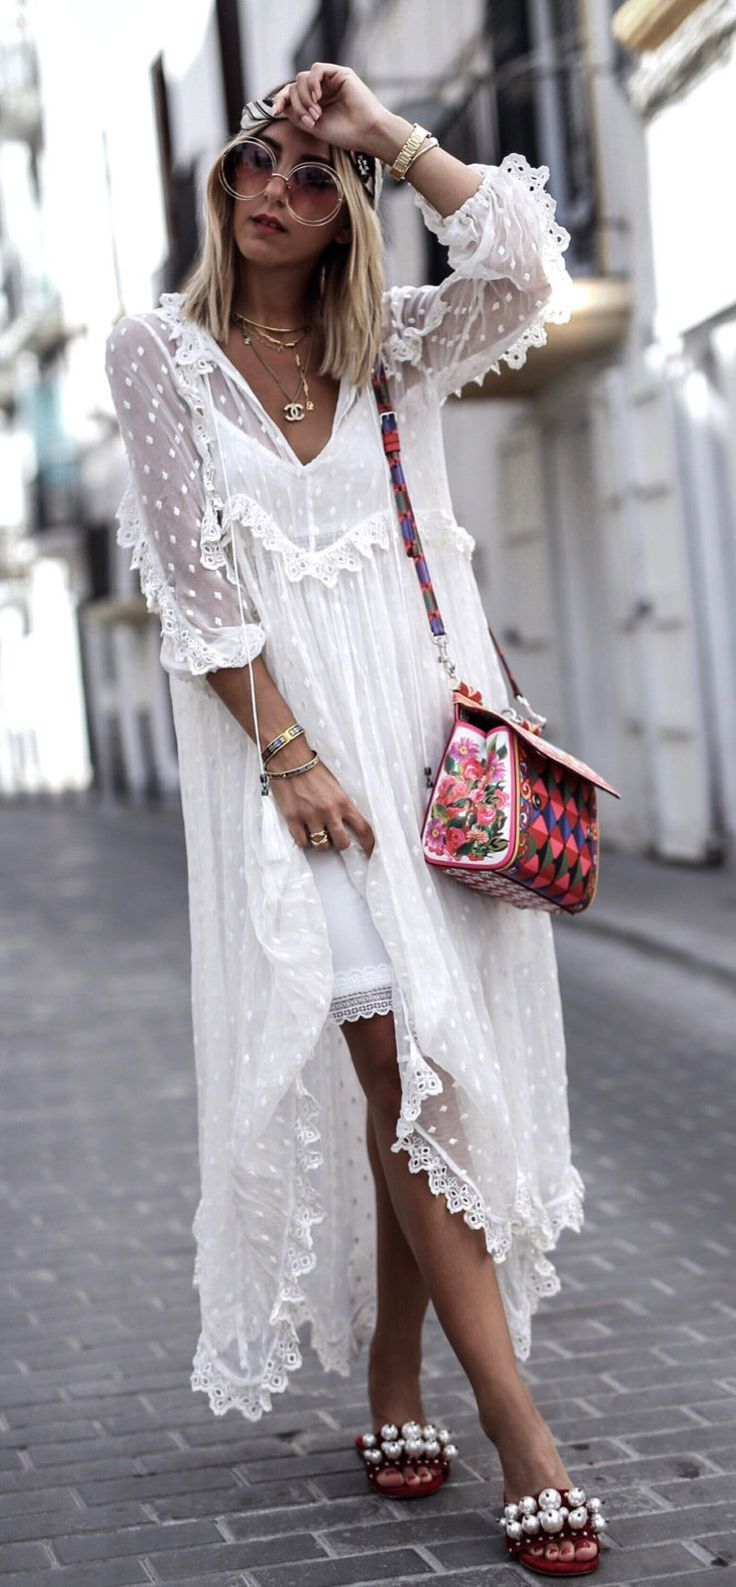 #summer #outfits White Tulle Maxi Dress + Floral Shoulder Bag